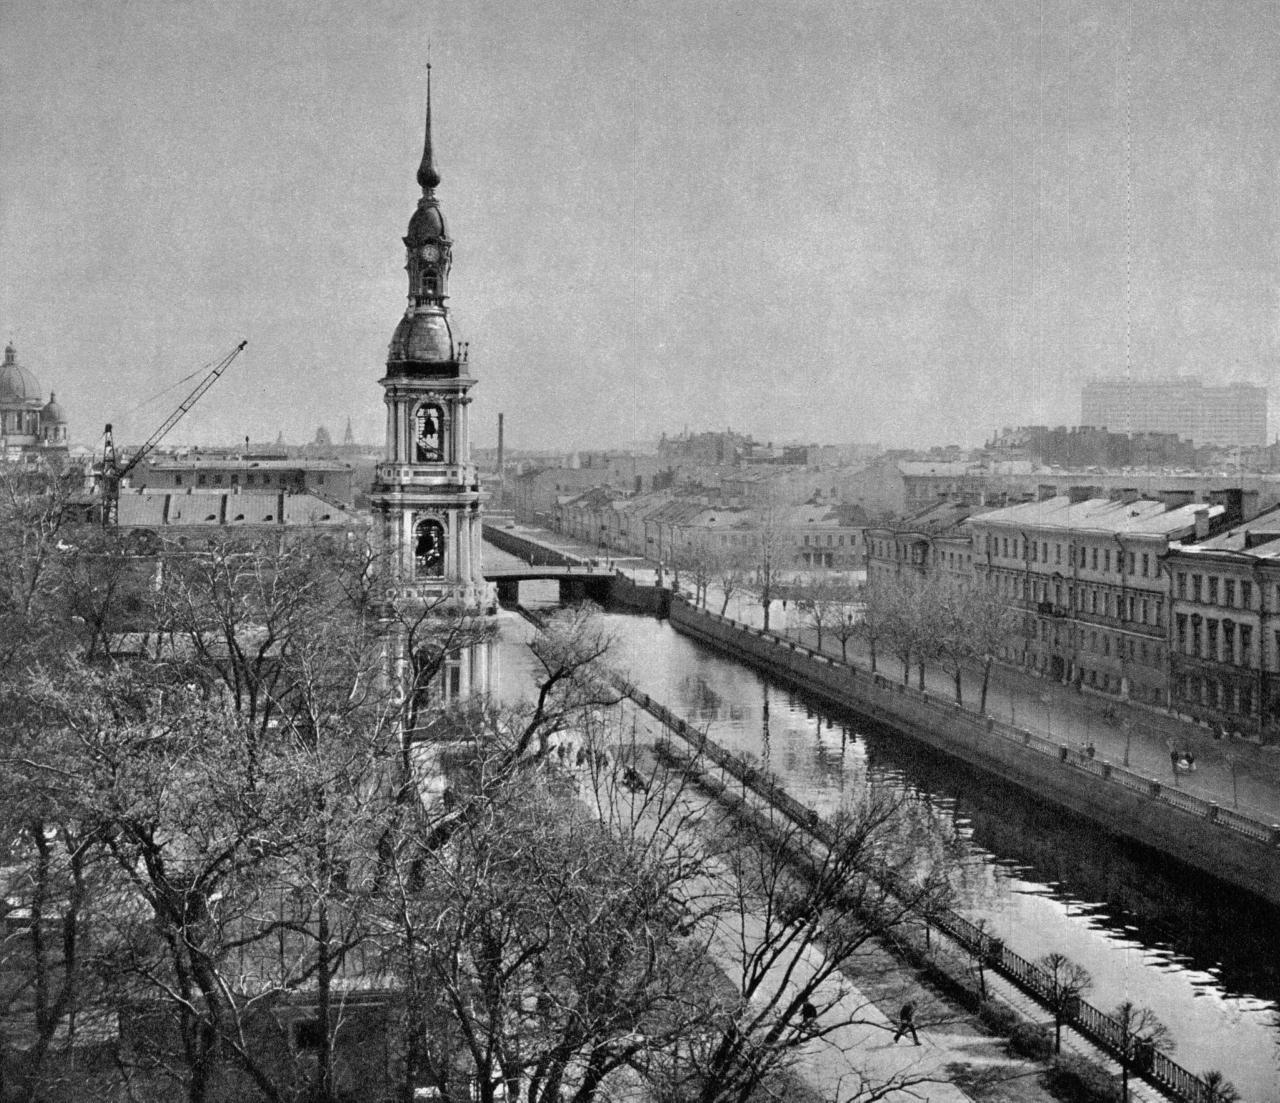 Крюков канал у Никольского собора / Kriukov Canal near St. Nicholas's Cathedral